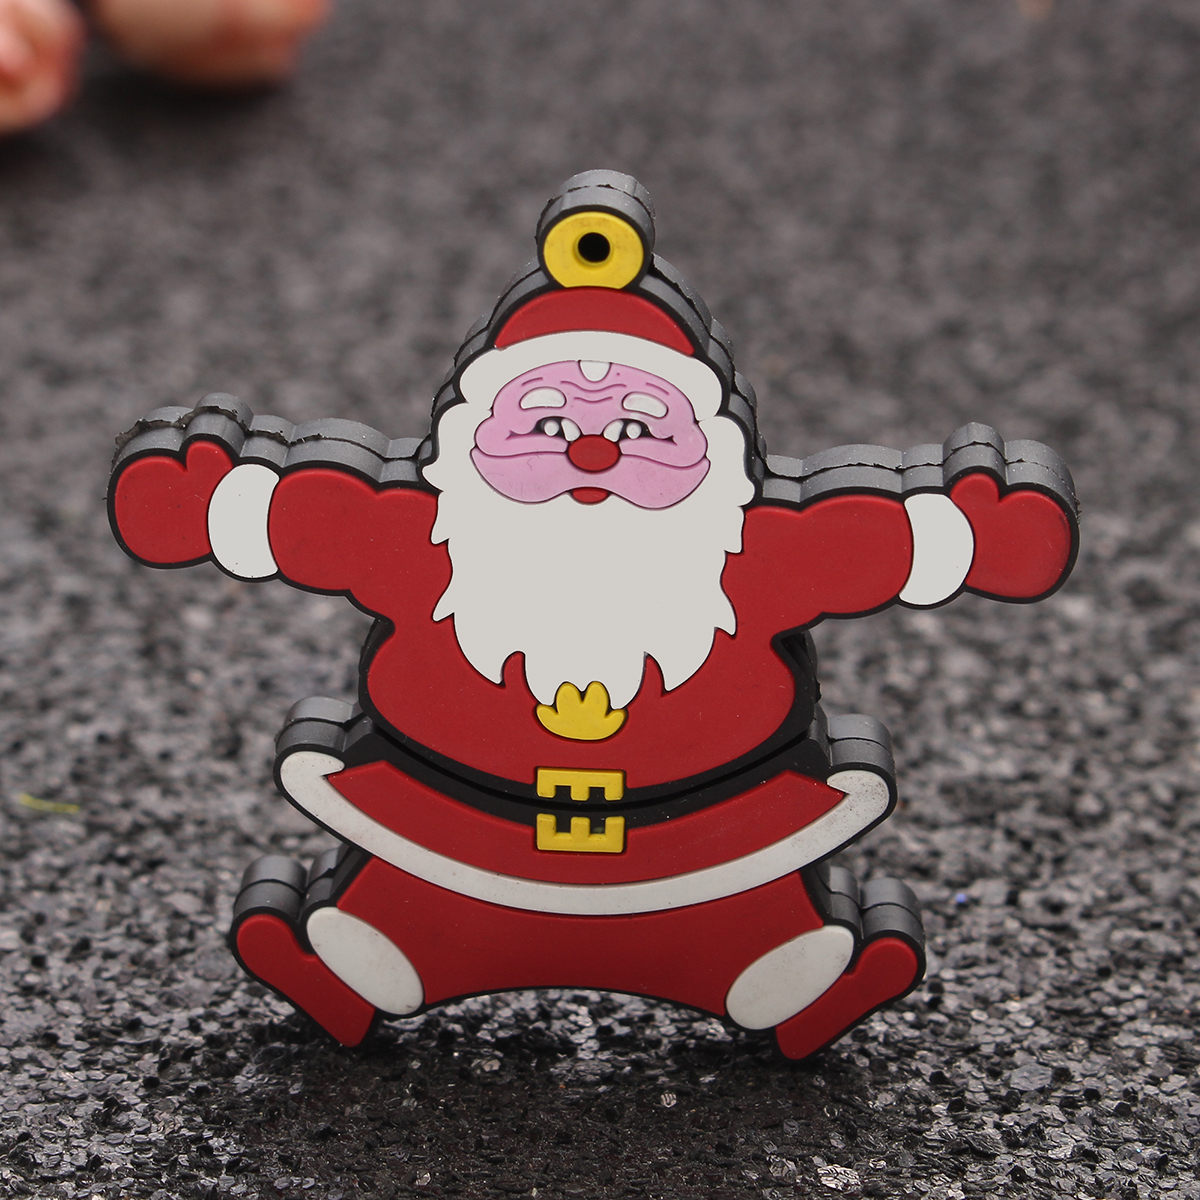 Lot 10/20/50 1GB Santa Claus USB2.0 Flash Drive Memory Stick Christmas Gifts